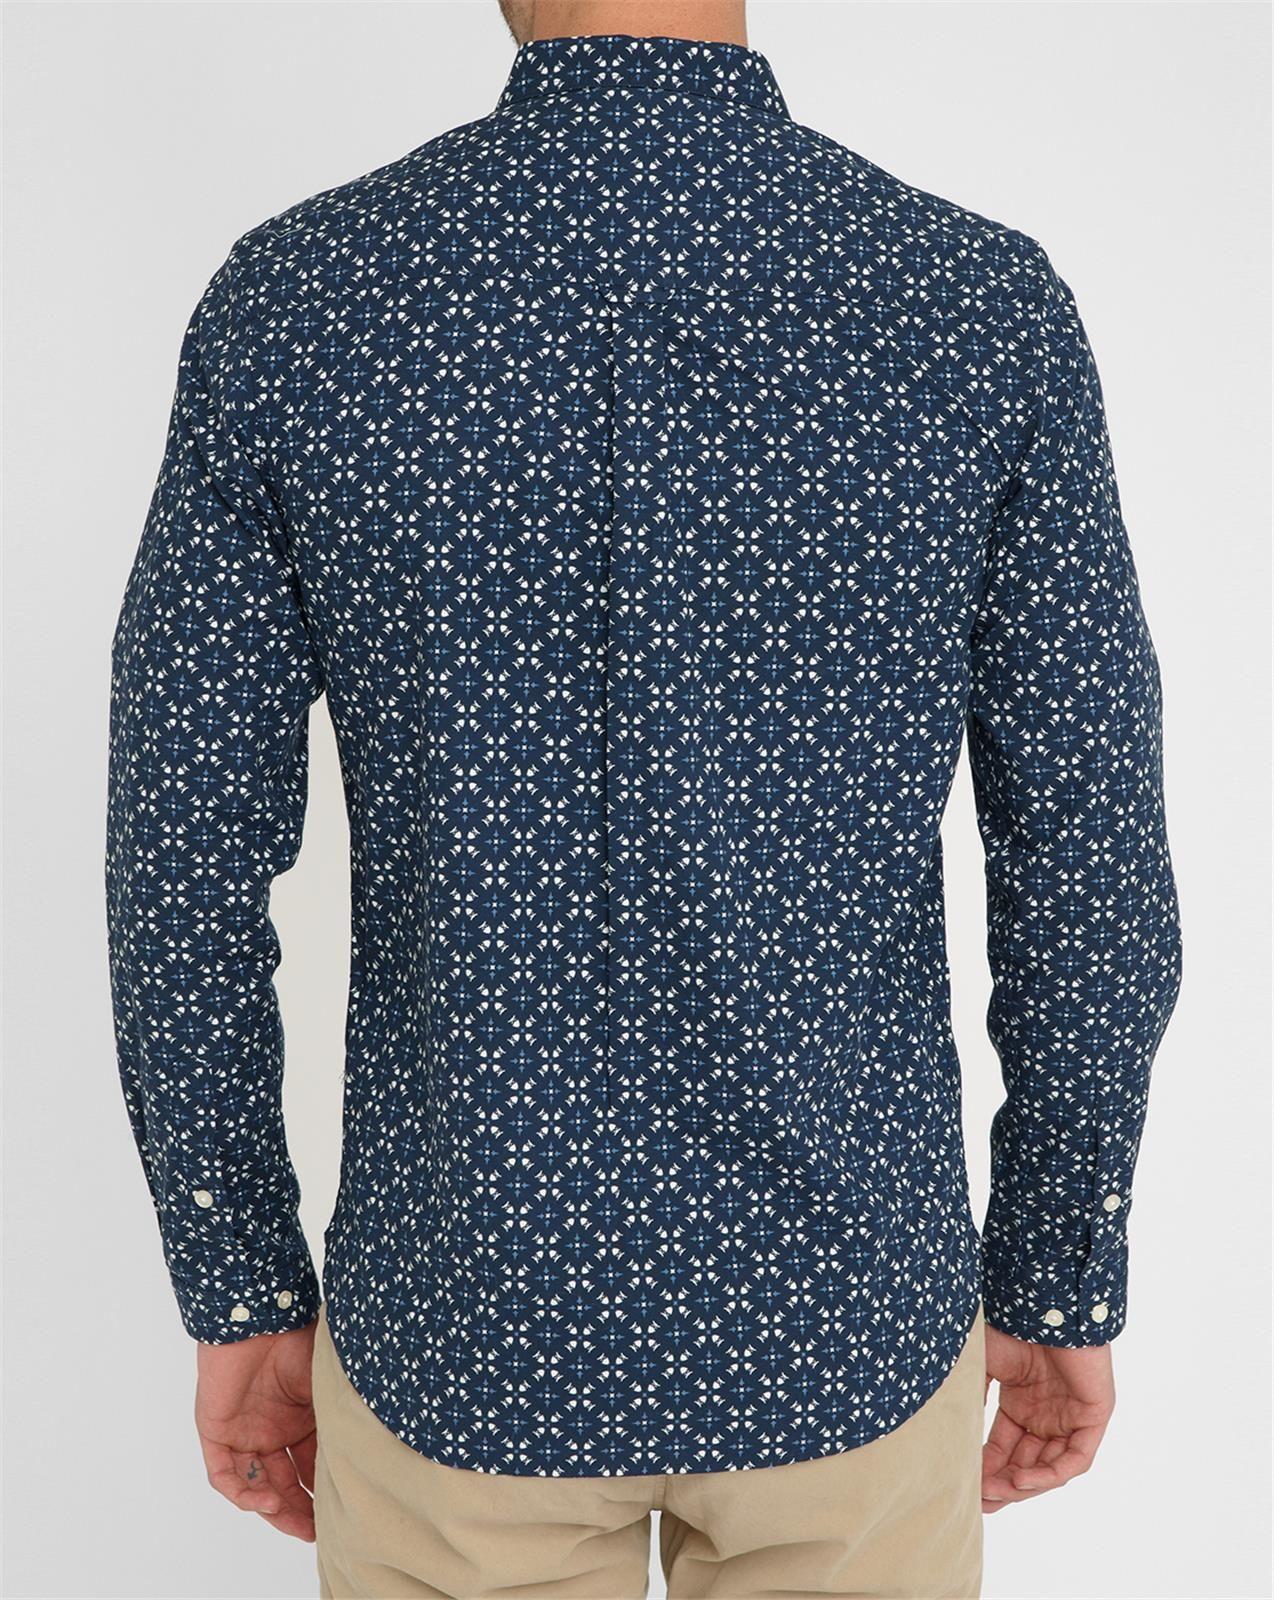 knowledge cotton apparel blue owl print shirt in blue for men lyst. Black Bedroom Furniture Sets. Home Design Ideas